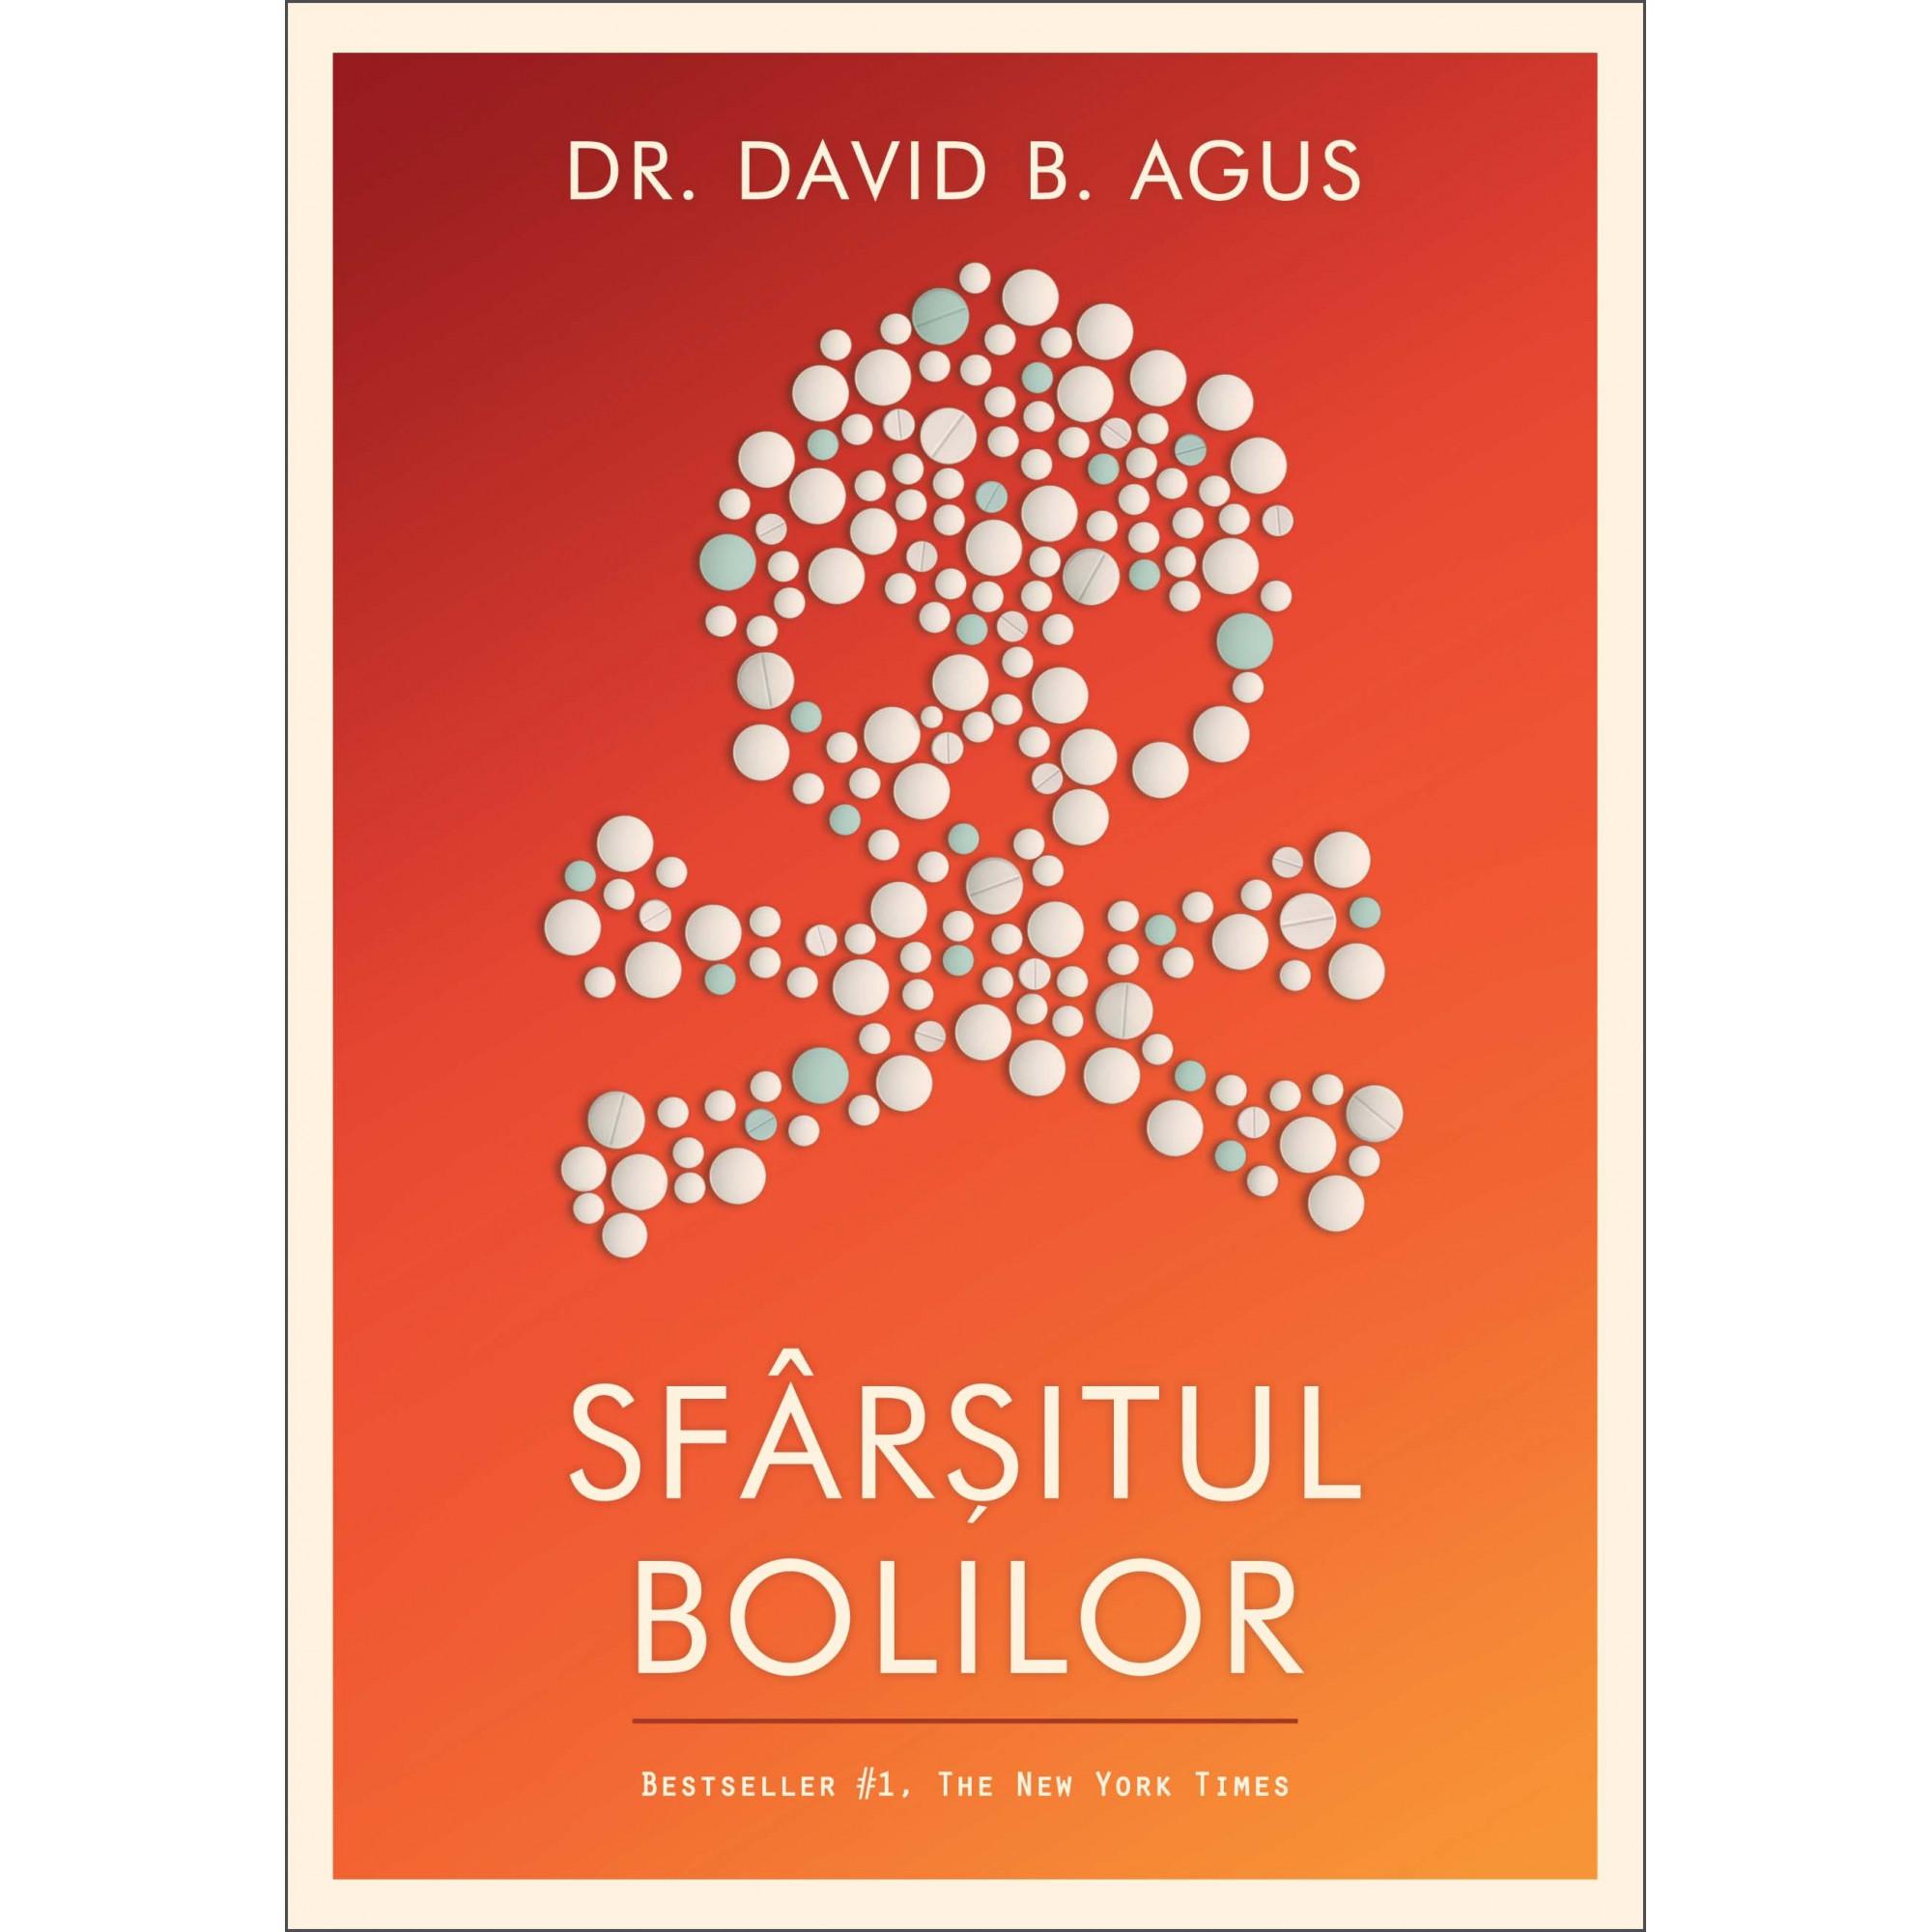 Sfârșitul bolilor; Dr. David B. Agus și Kristin Loberg